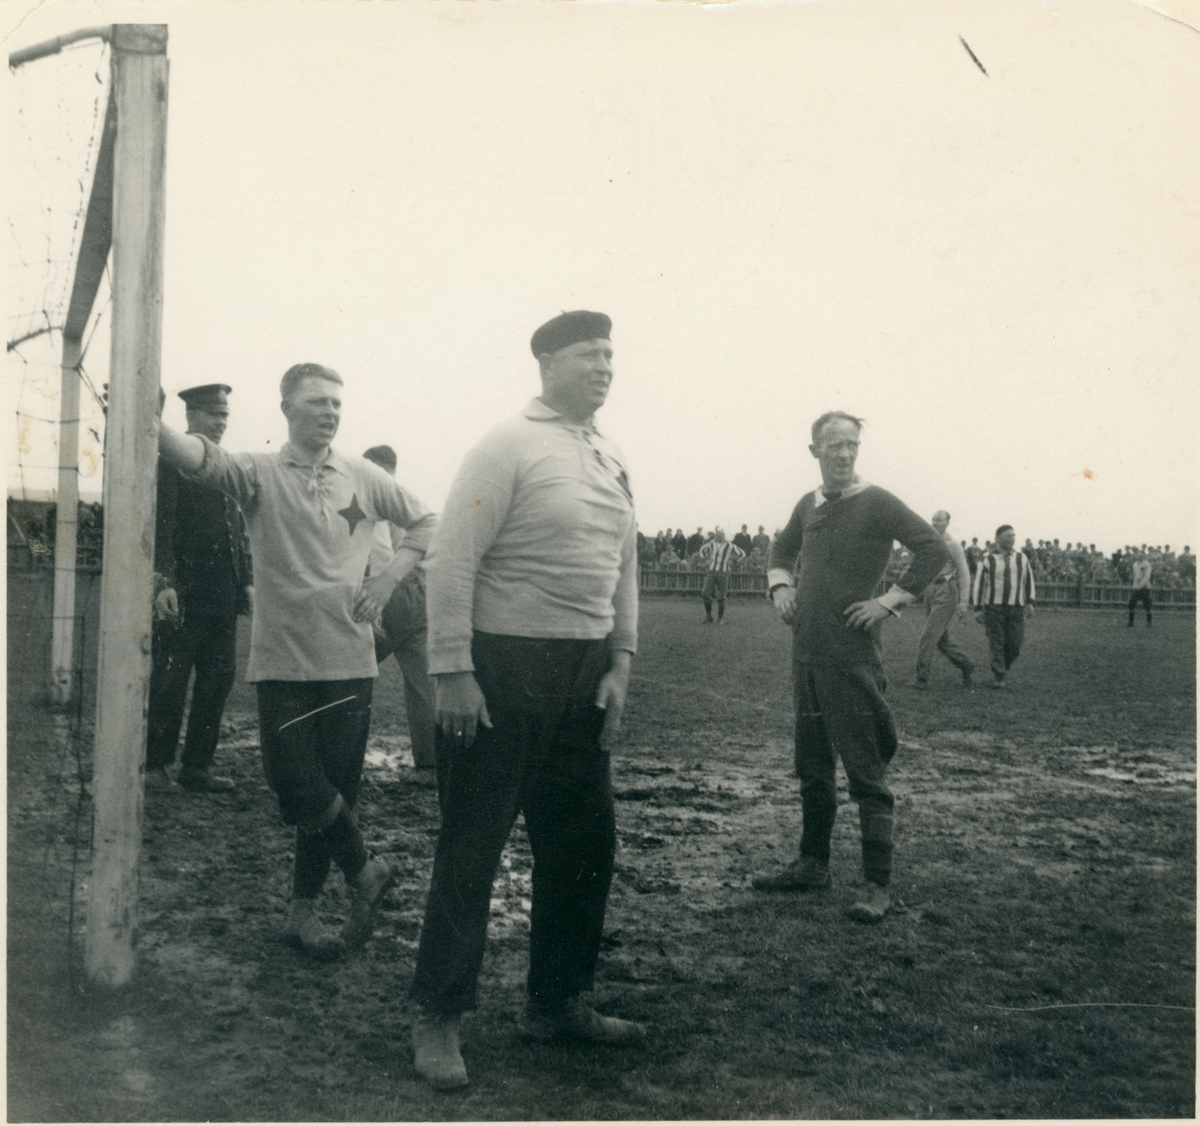 Fotbollsmatch. Polisen möter brandkåren